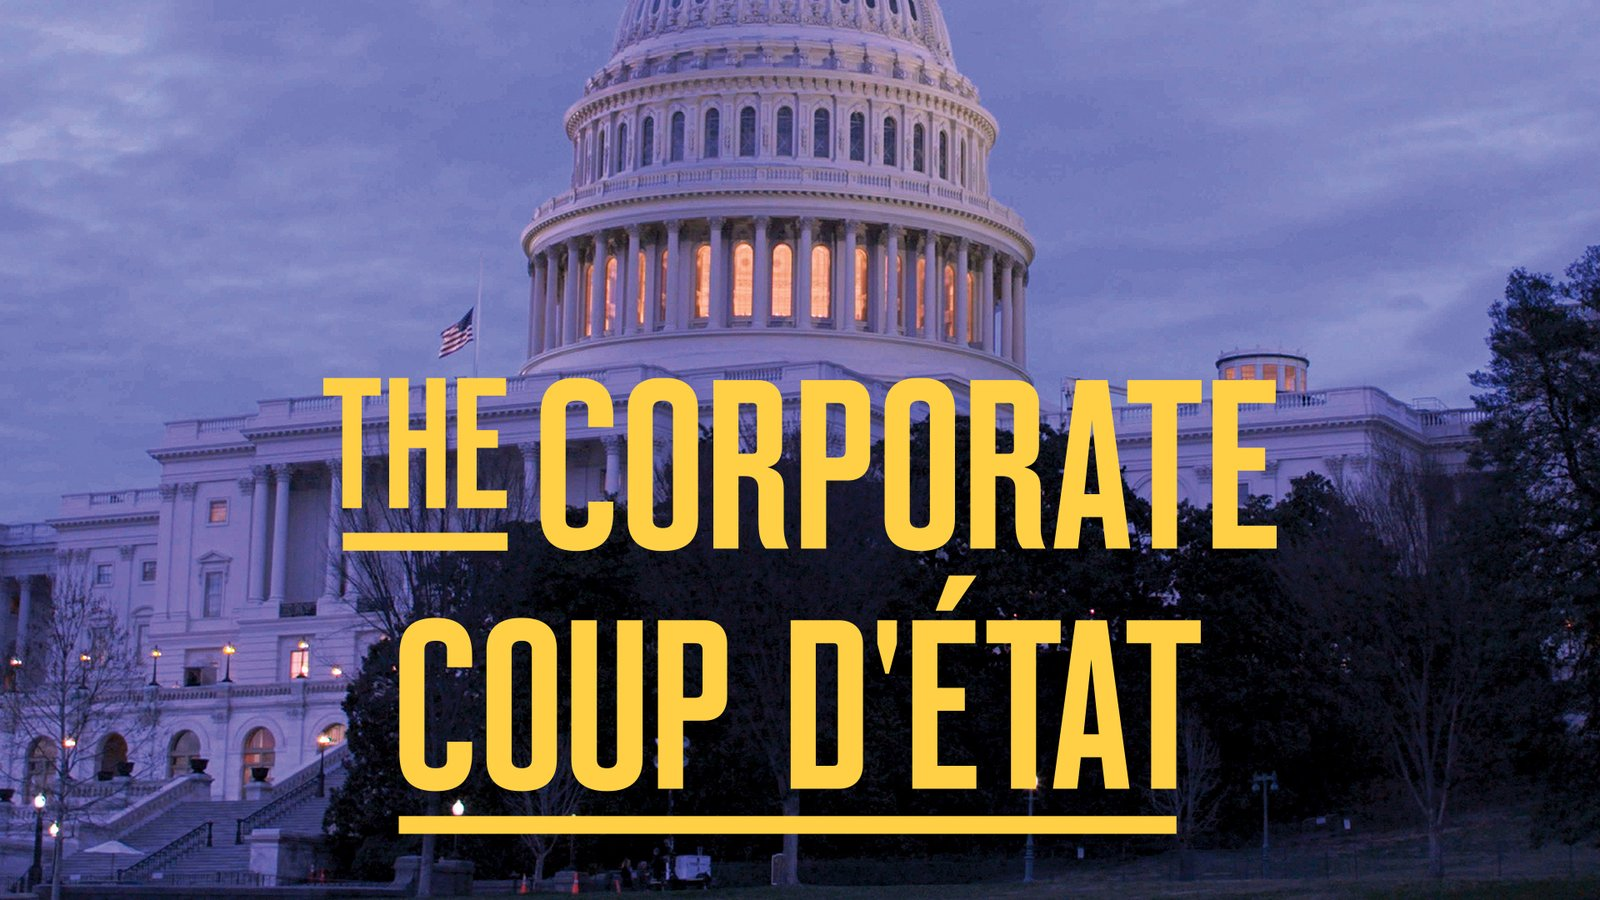 The Corporate Coup D'etat - How Capitalist Interests Subvert American Democracy